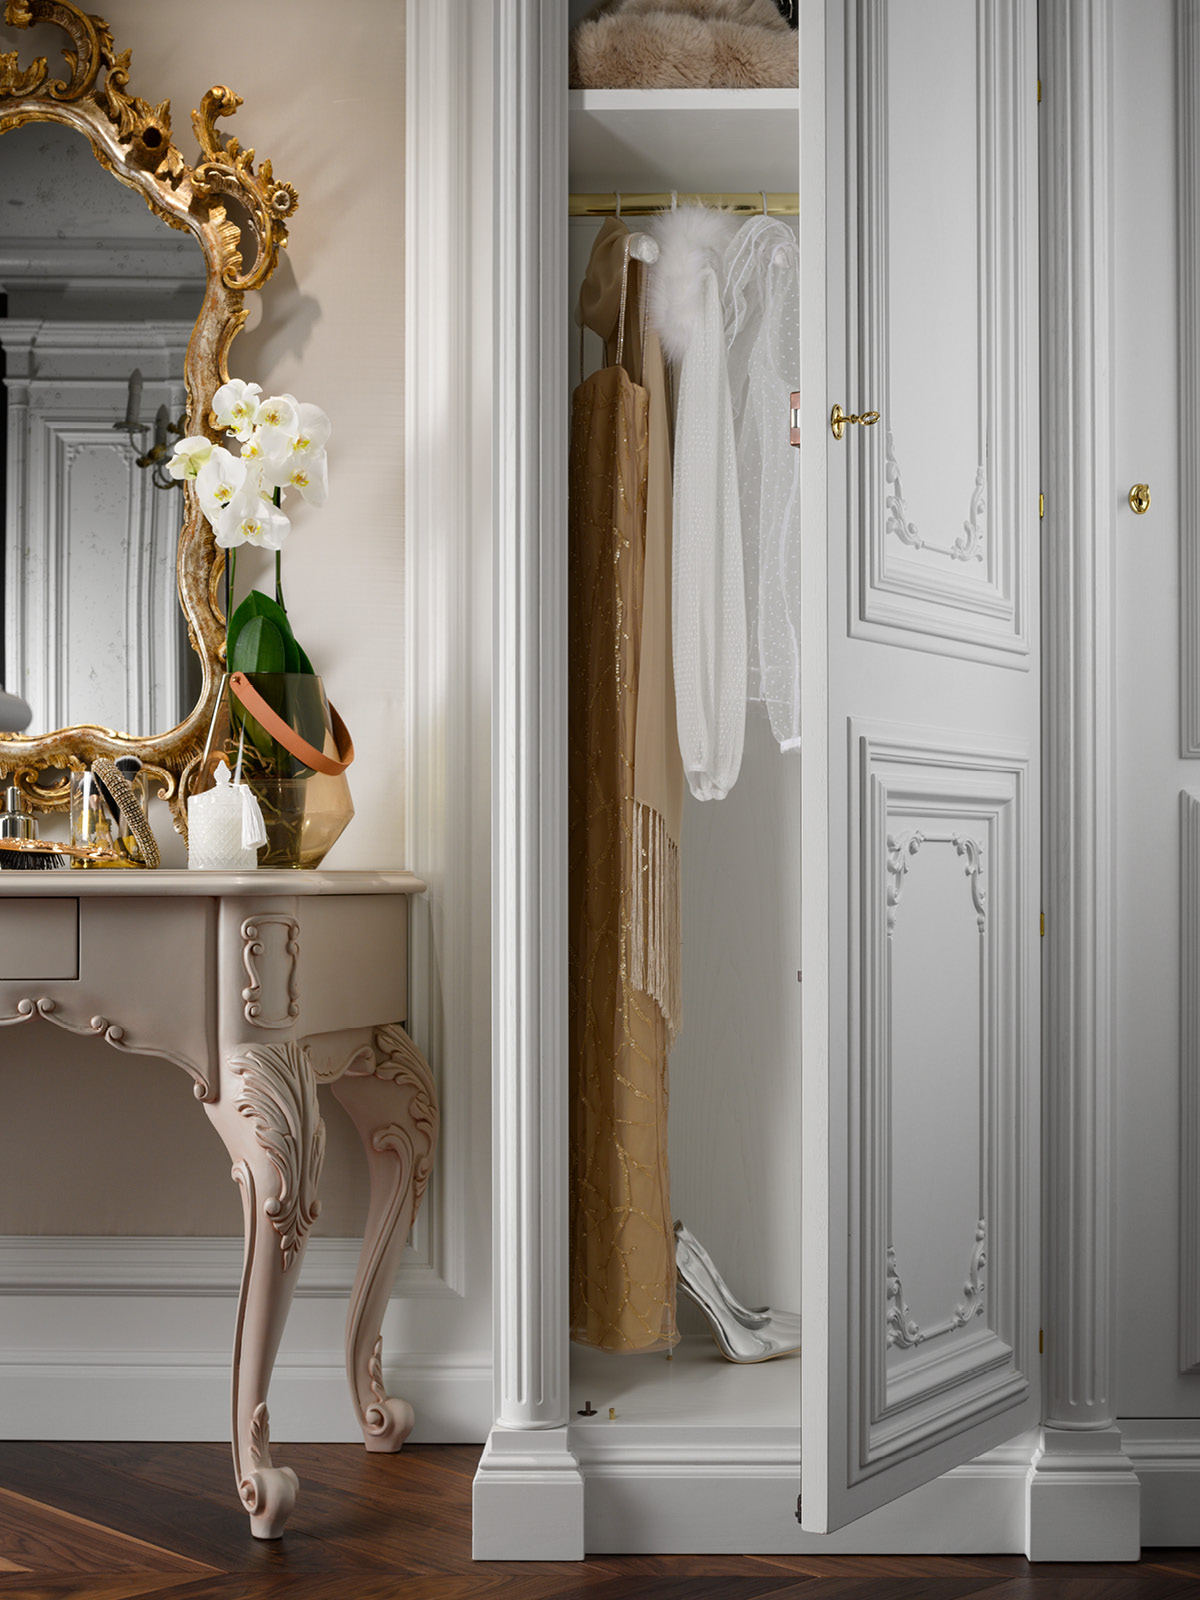 Detail on interior for long clothing hanger